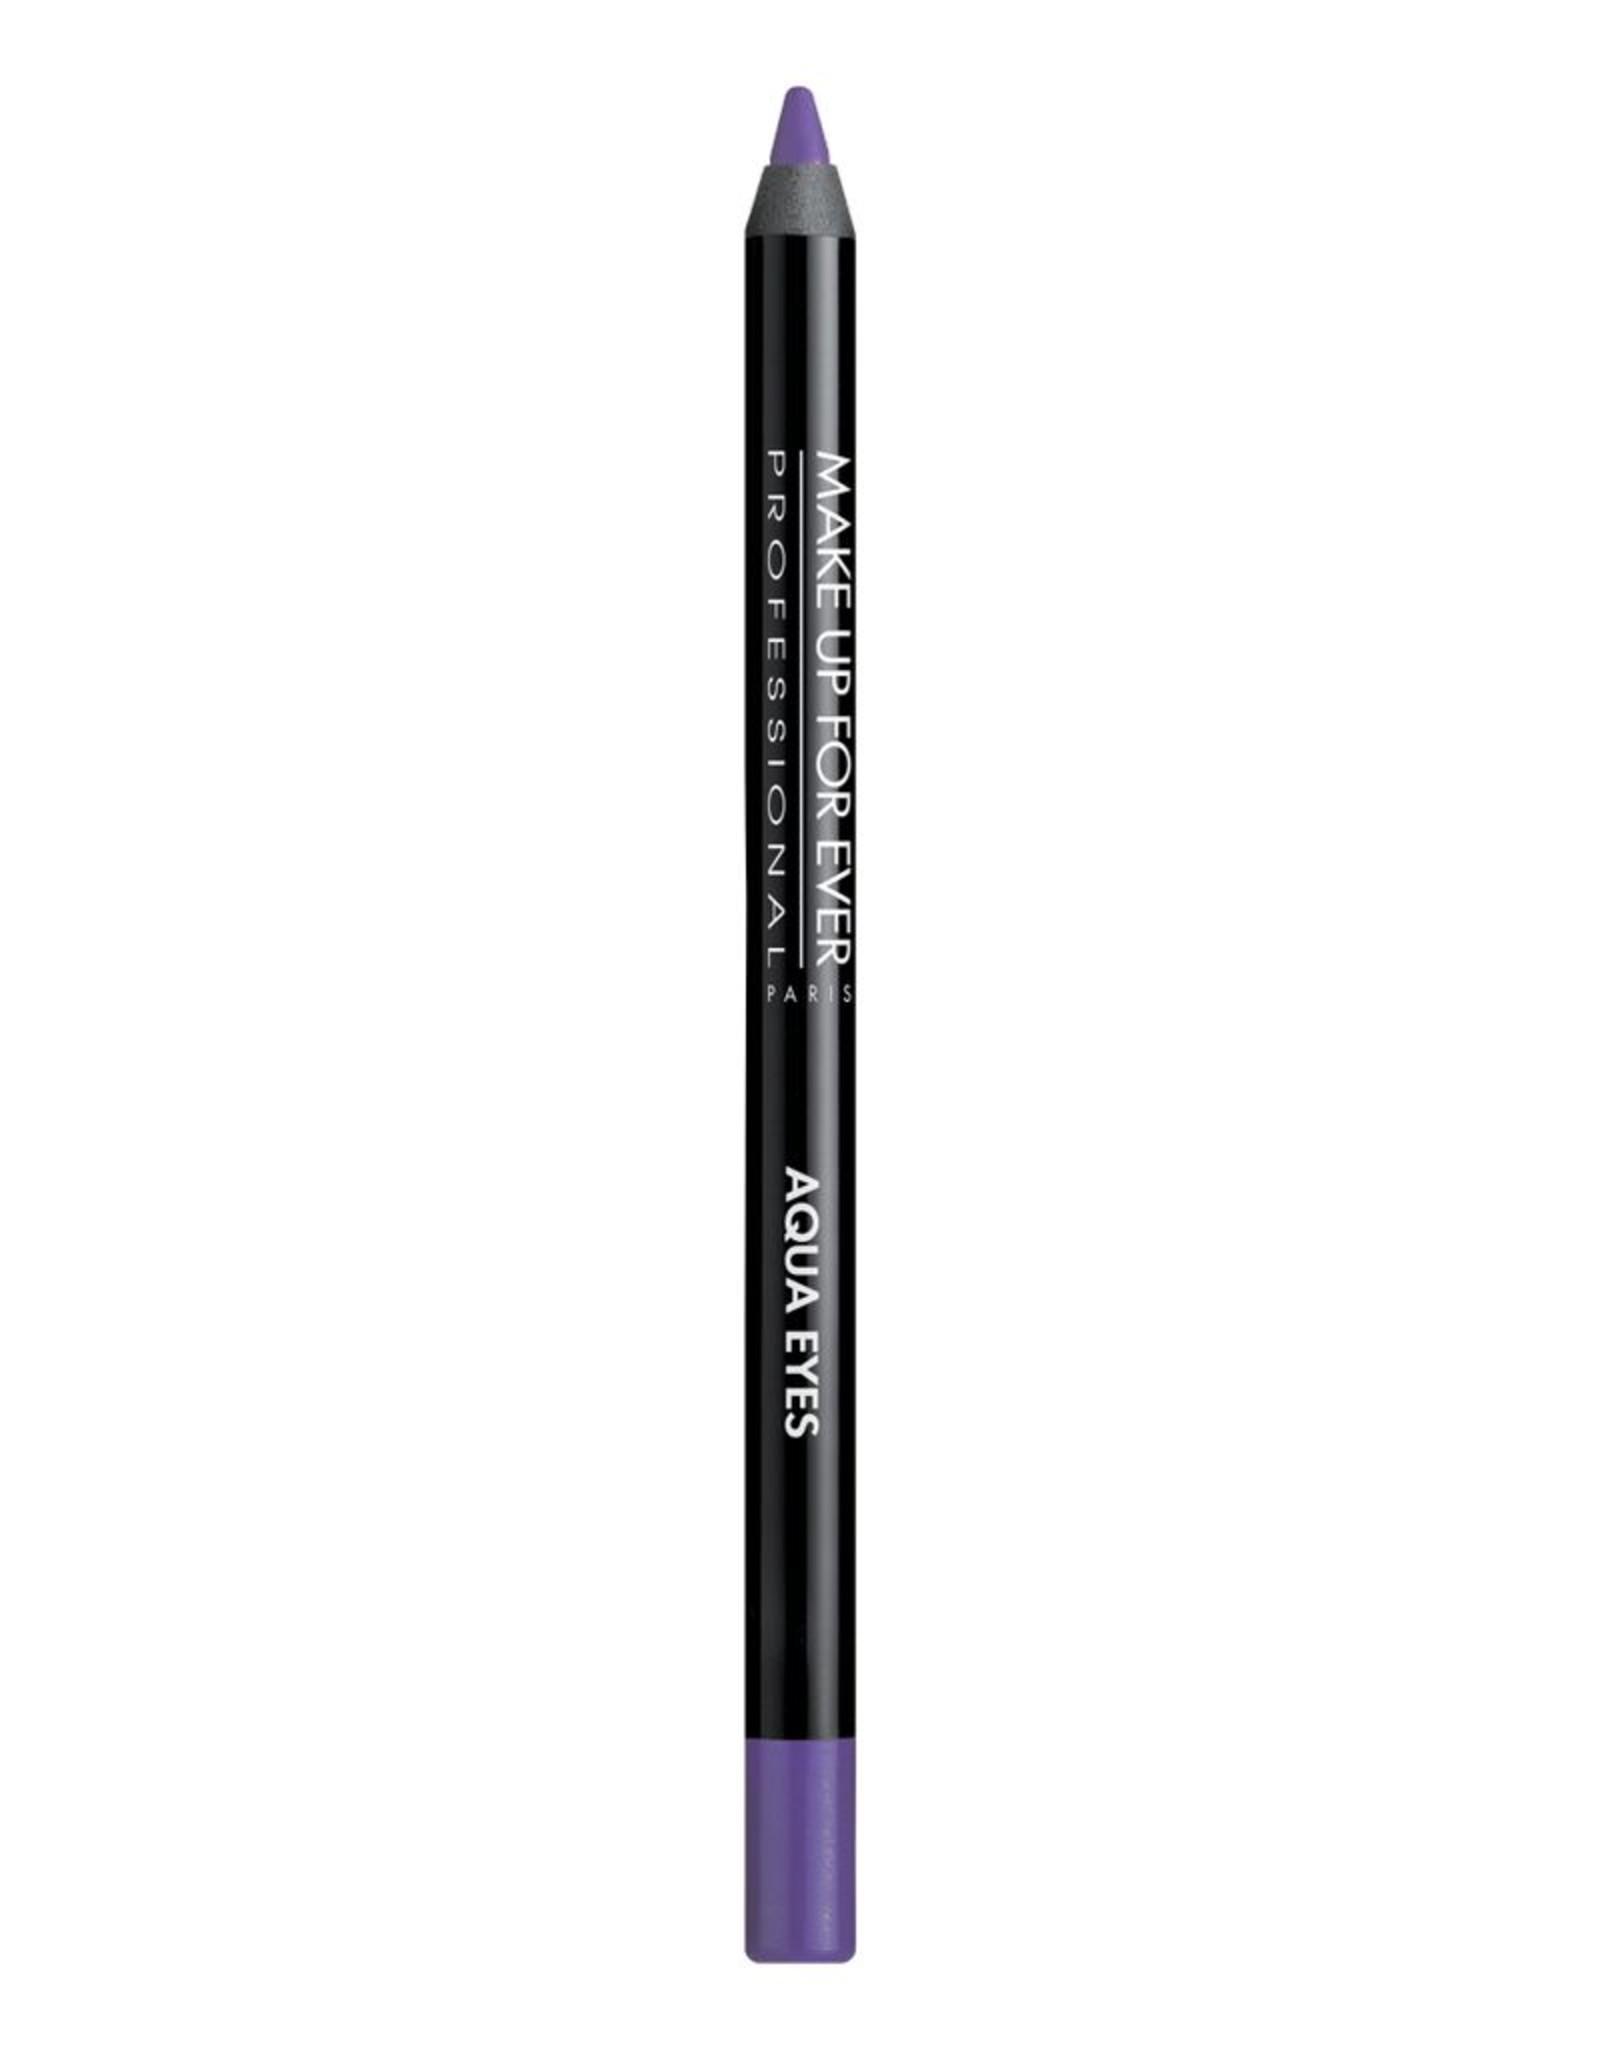 MUFE AQUA EYES CRAYON YEUX WTP NACRE 1,2g 11L violet / purple